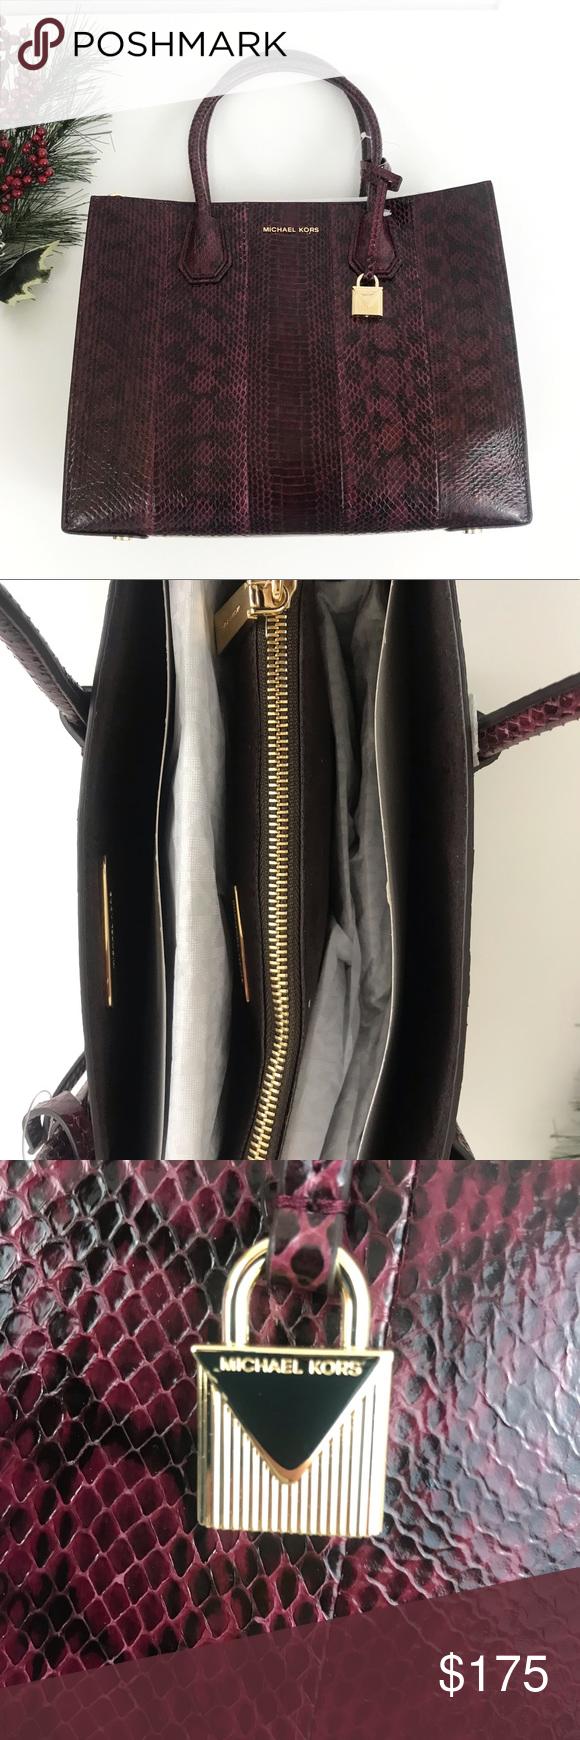 a9727a7fe5ab Michael Kors Mercer Snakeskin Tote✨✨Brand New! Michael Kors Mercer Snakeskin  Tote✨✨Brand New! • 100% Water Snake • Gold-Tone Hardware • 12.5